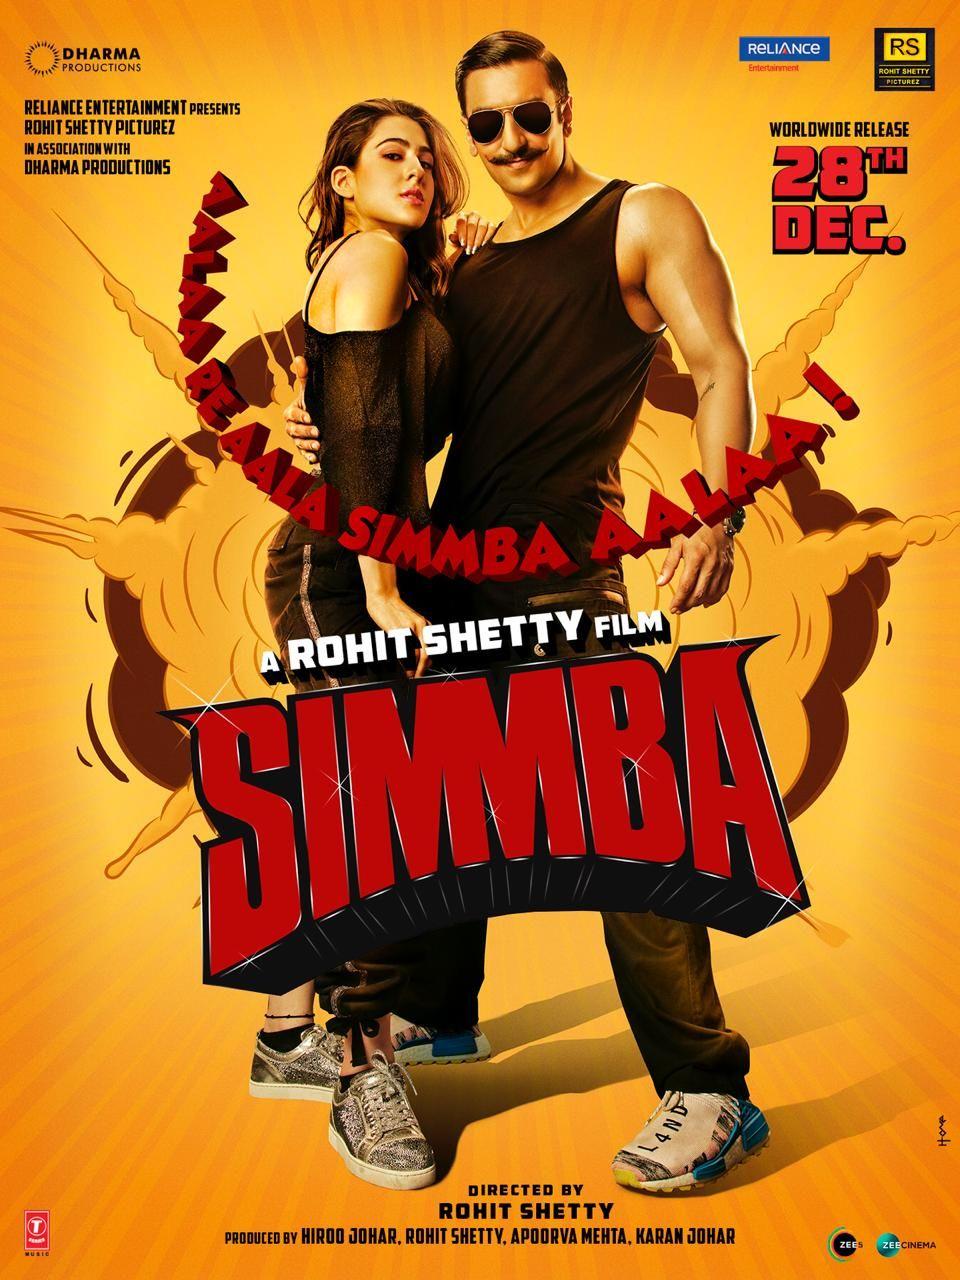 Simmba (2019) 720p + 1080p WEB-DL x264 ESubs AAC Hindi 1 36GB + 2 39